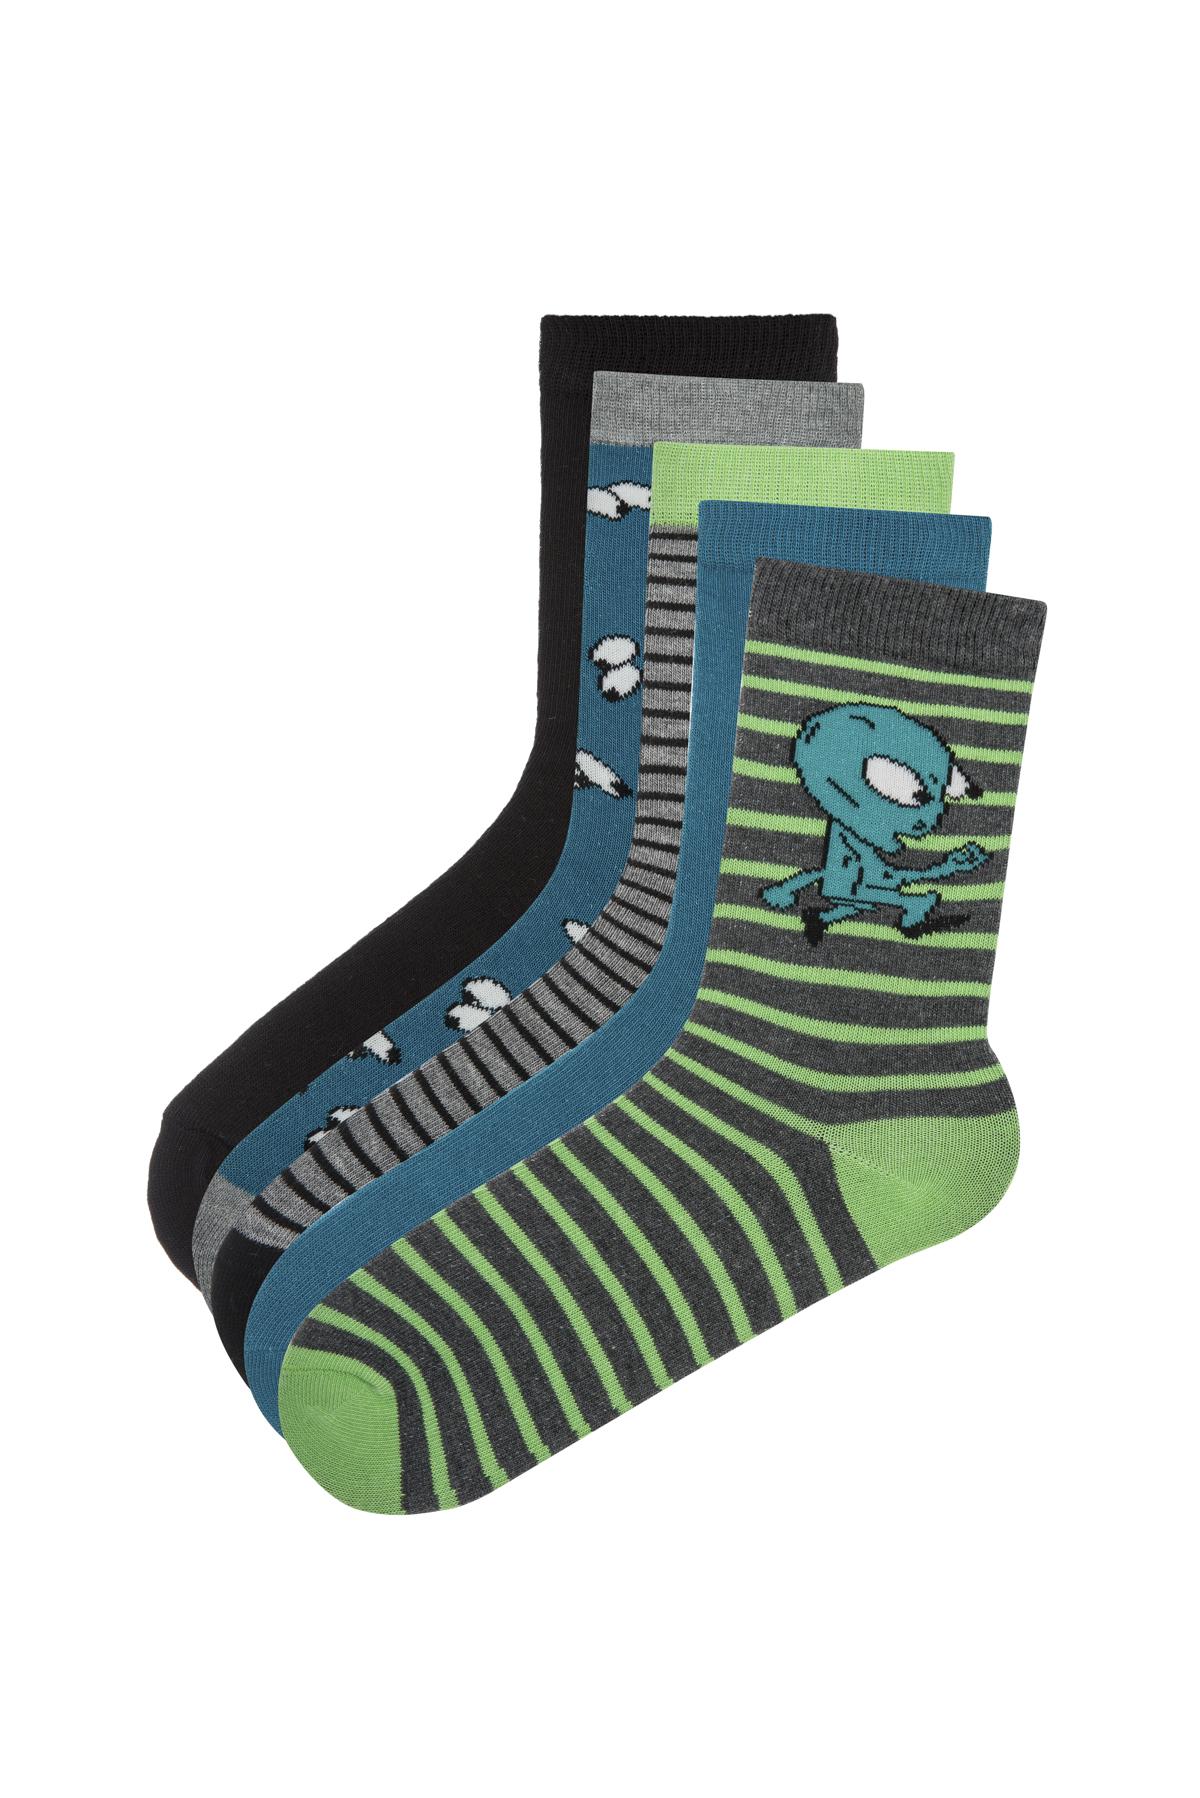 Boys Alien 5 in 1 Socks